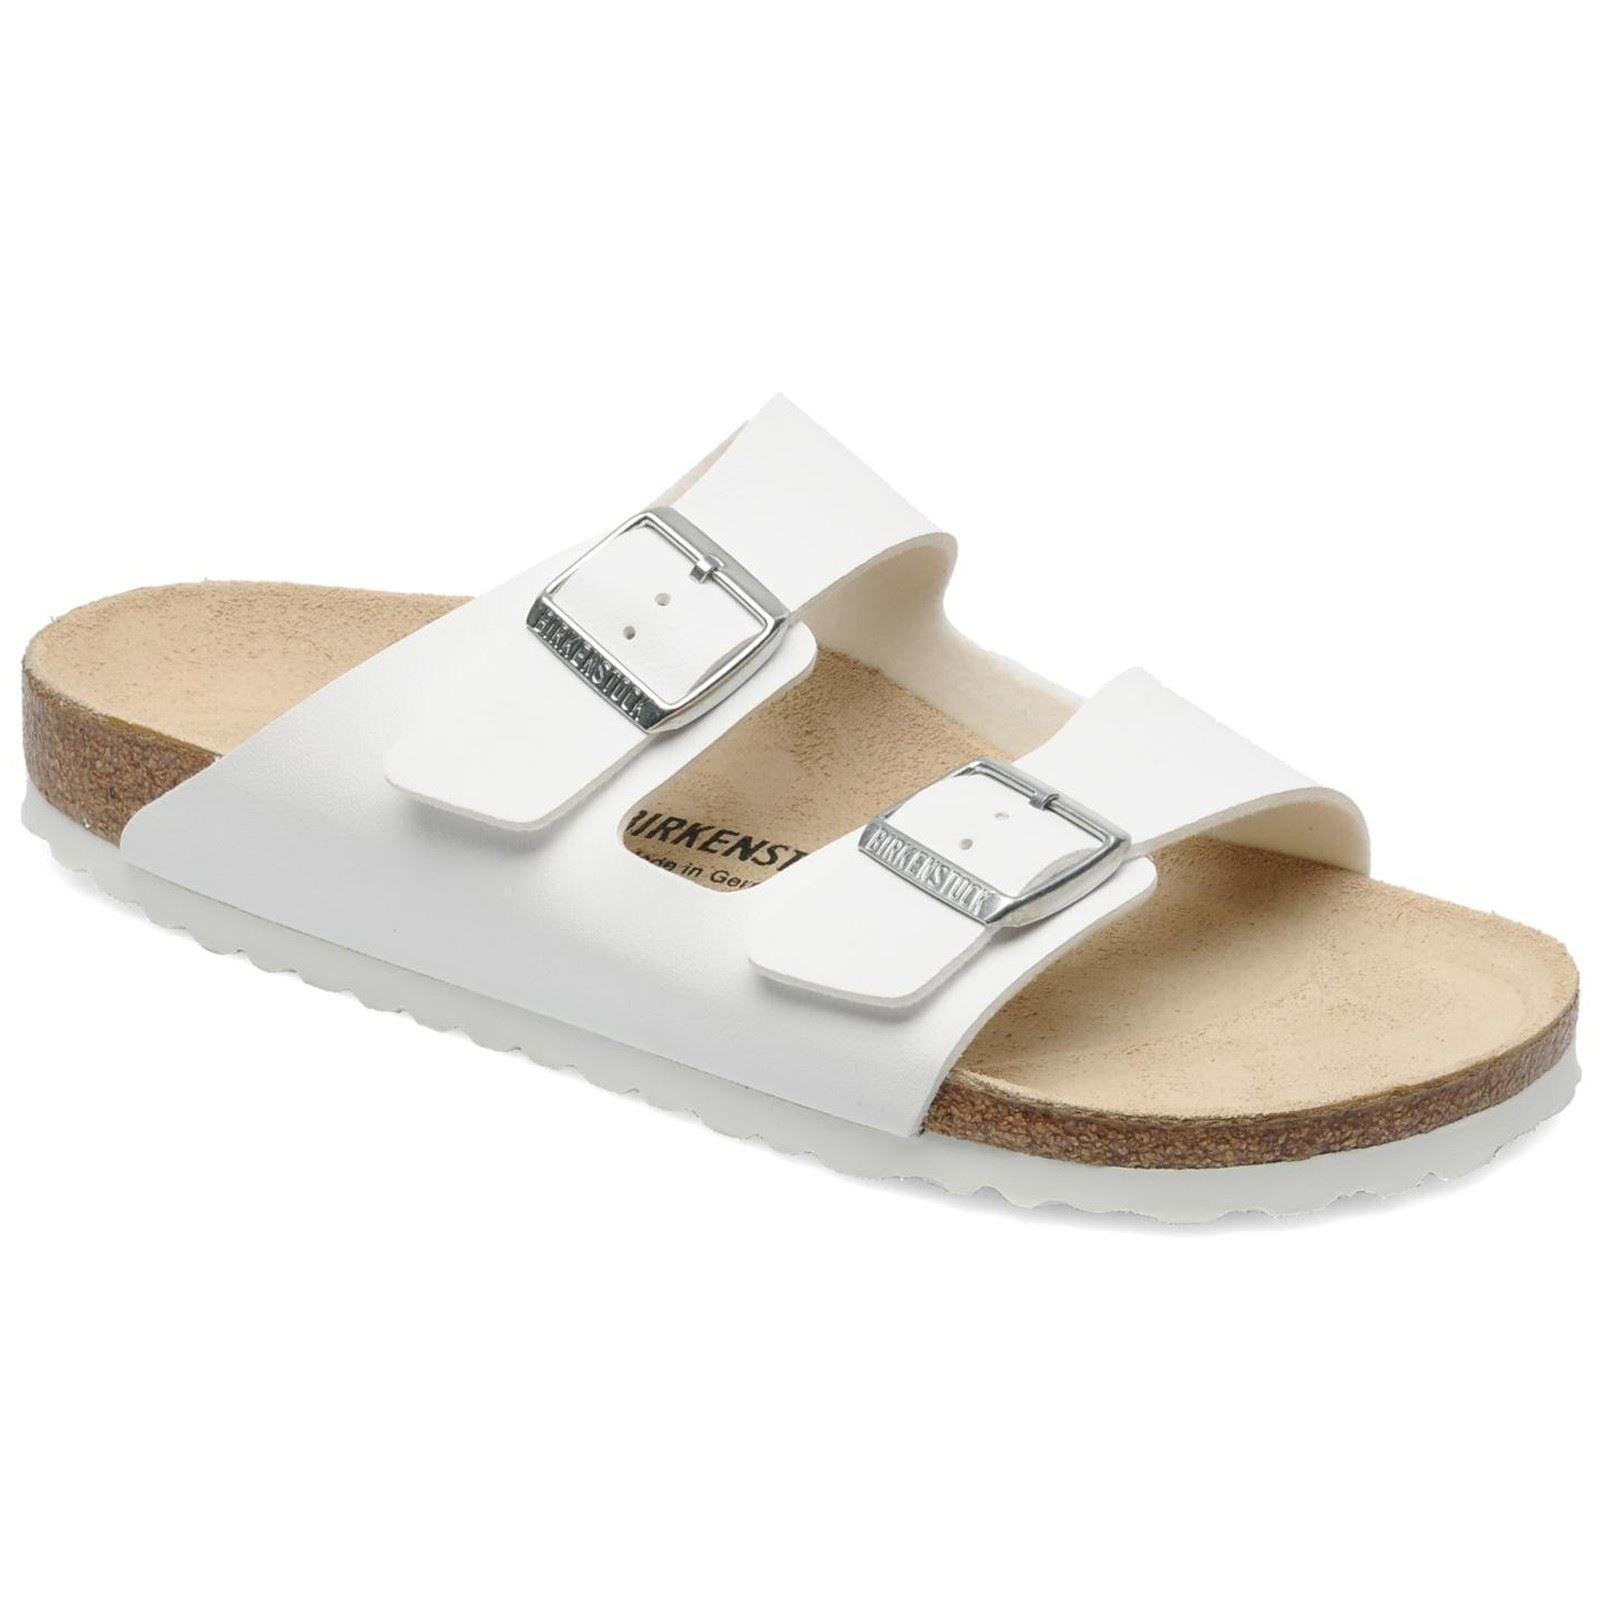 Birkenstock Arizona Sandals Birko Flor - EUR 36 - regular - white